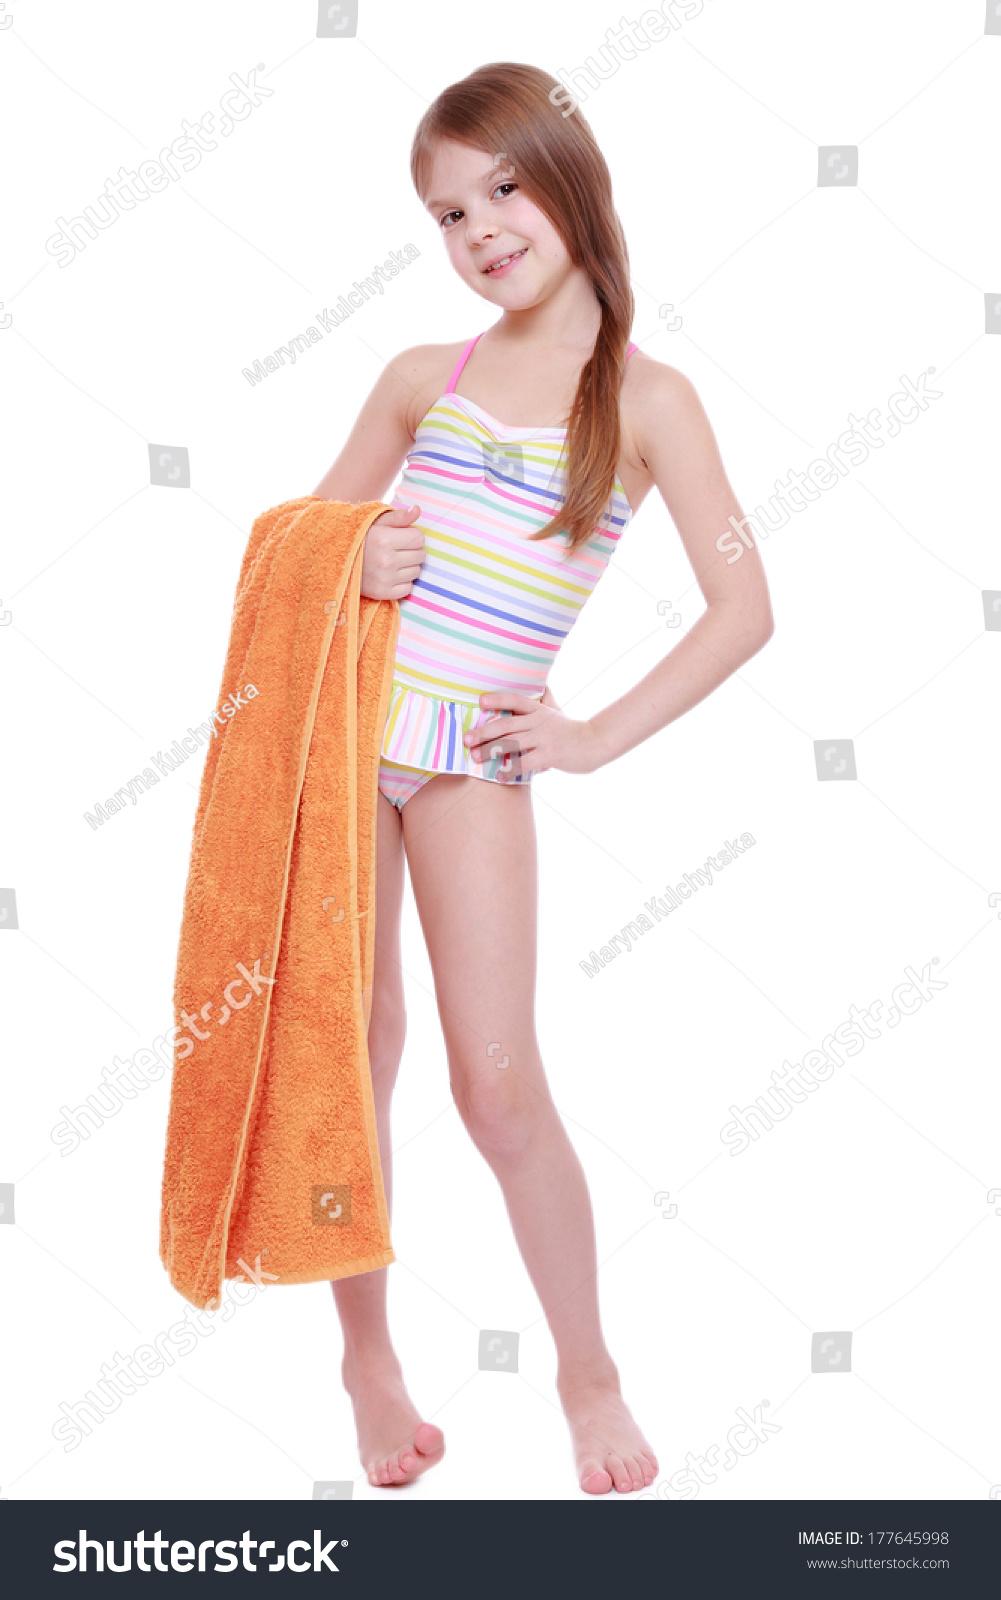 preeteens bikini caucasian little girl in swimsuit holding orange towel - stock photo